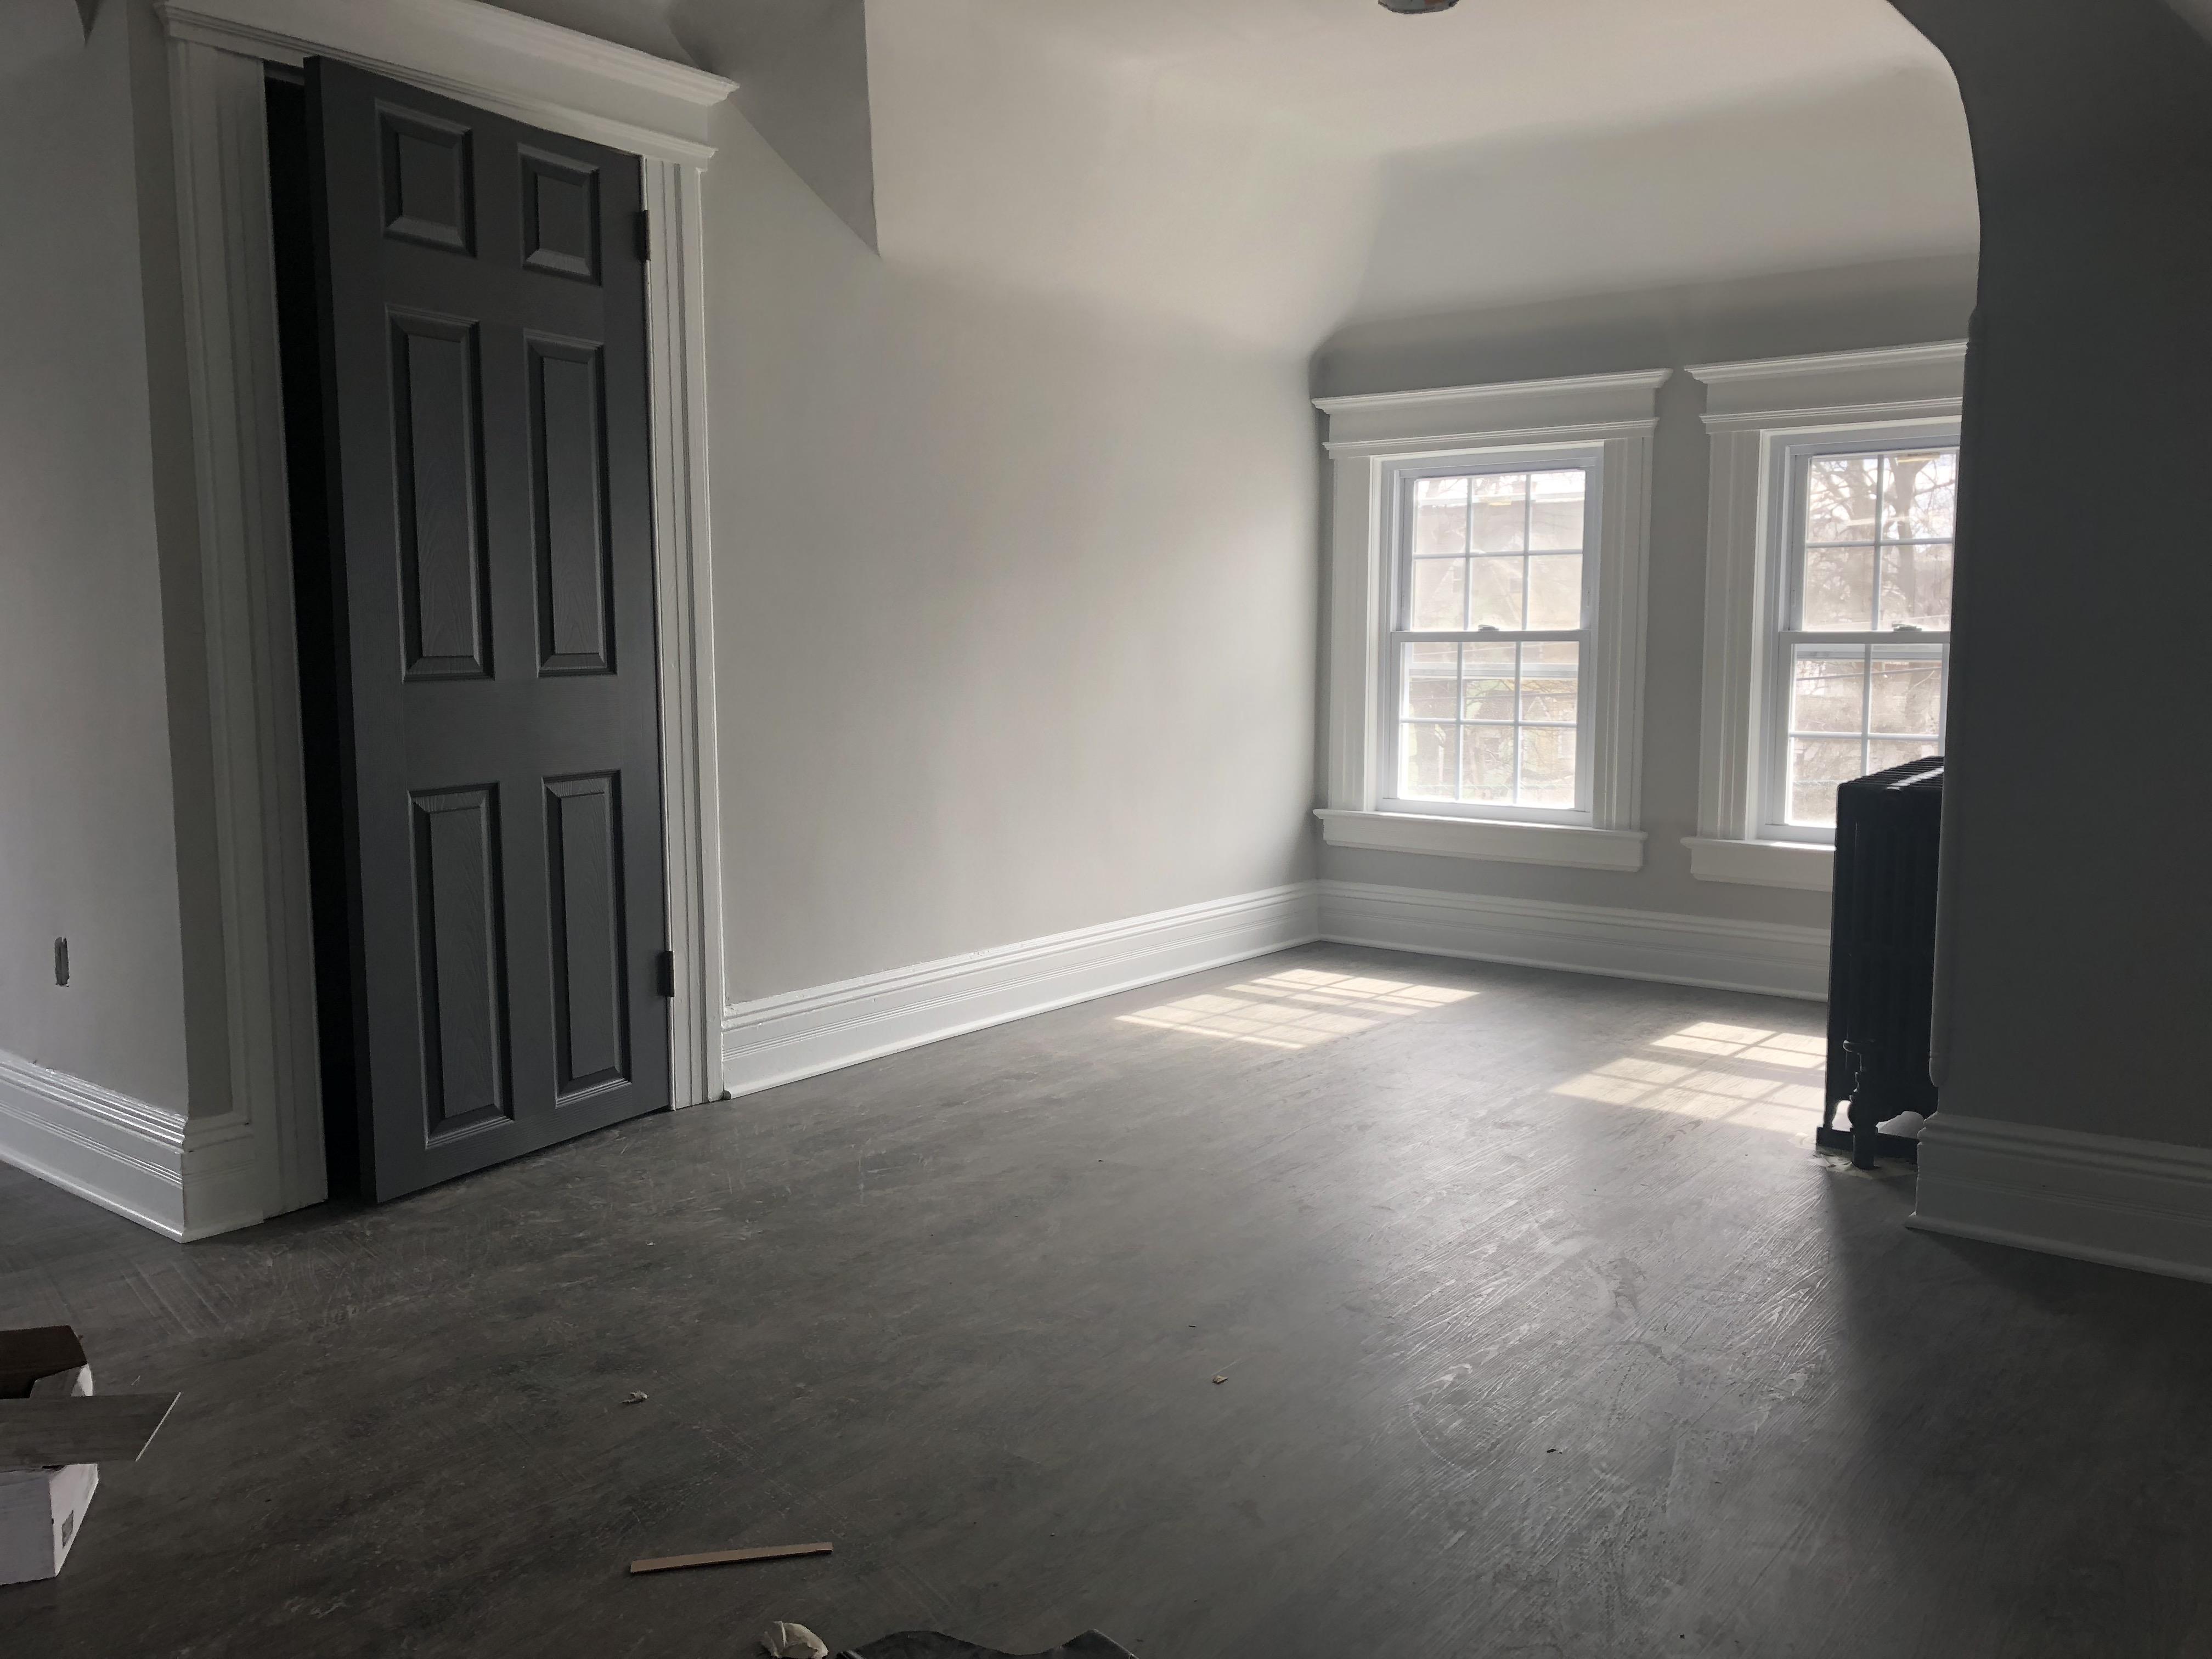 3rd Floor - After